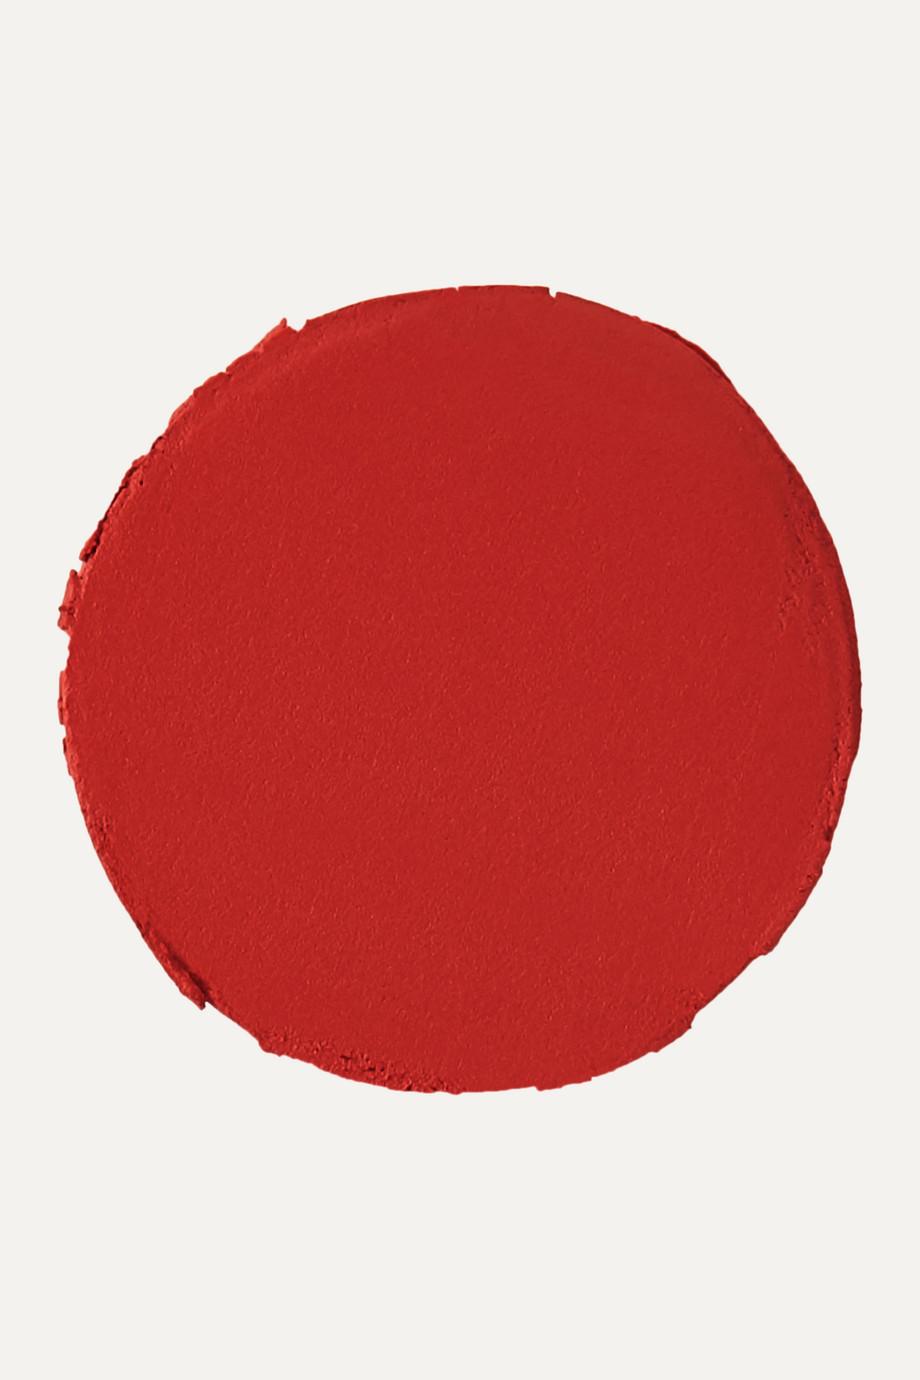 Shiseido ModernMatte Powder Lipstick – Hyper Red 514 – Lippenstift